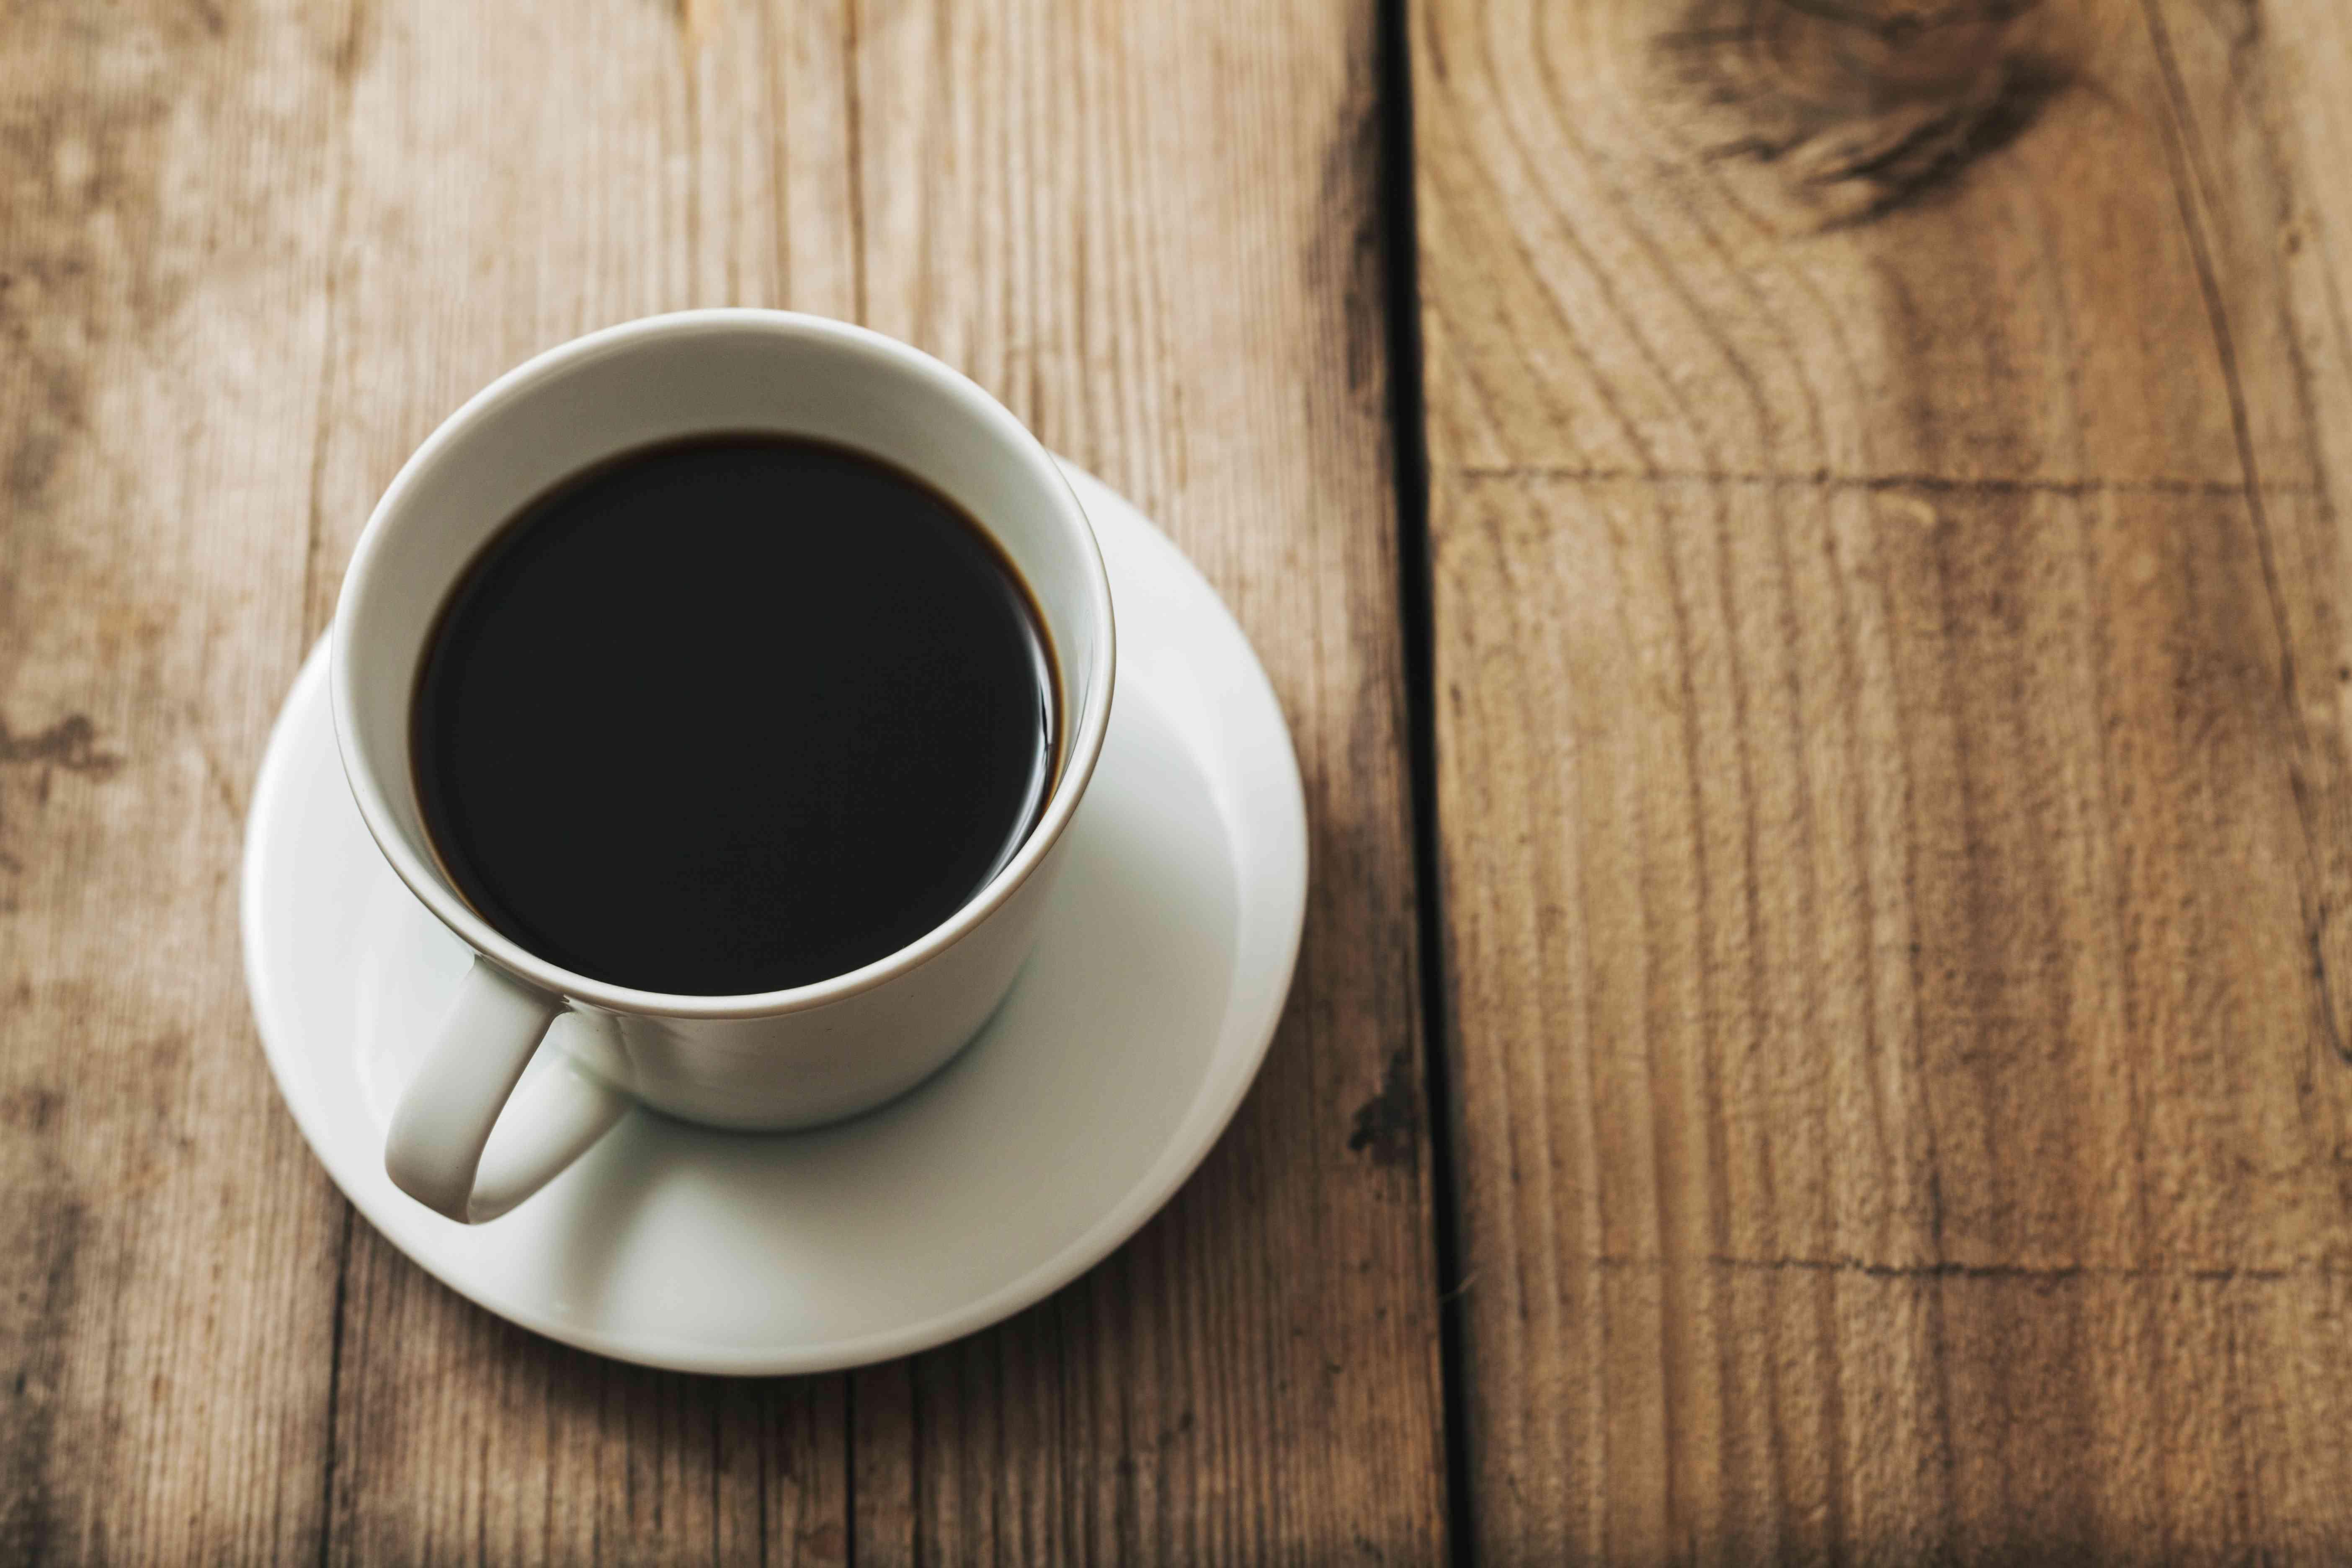 Cup of black coffee on wood